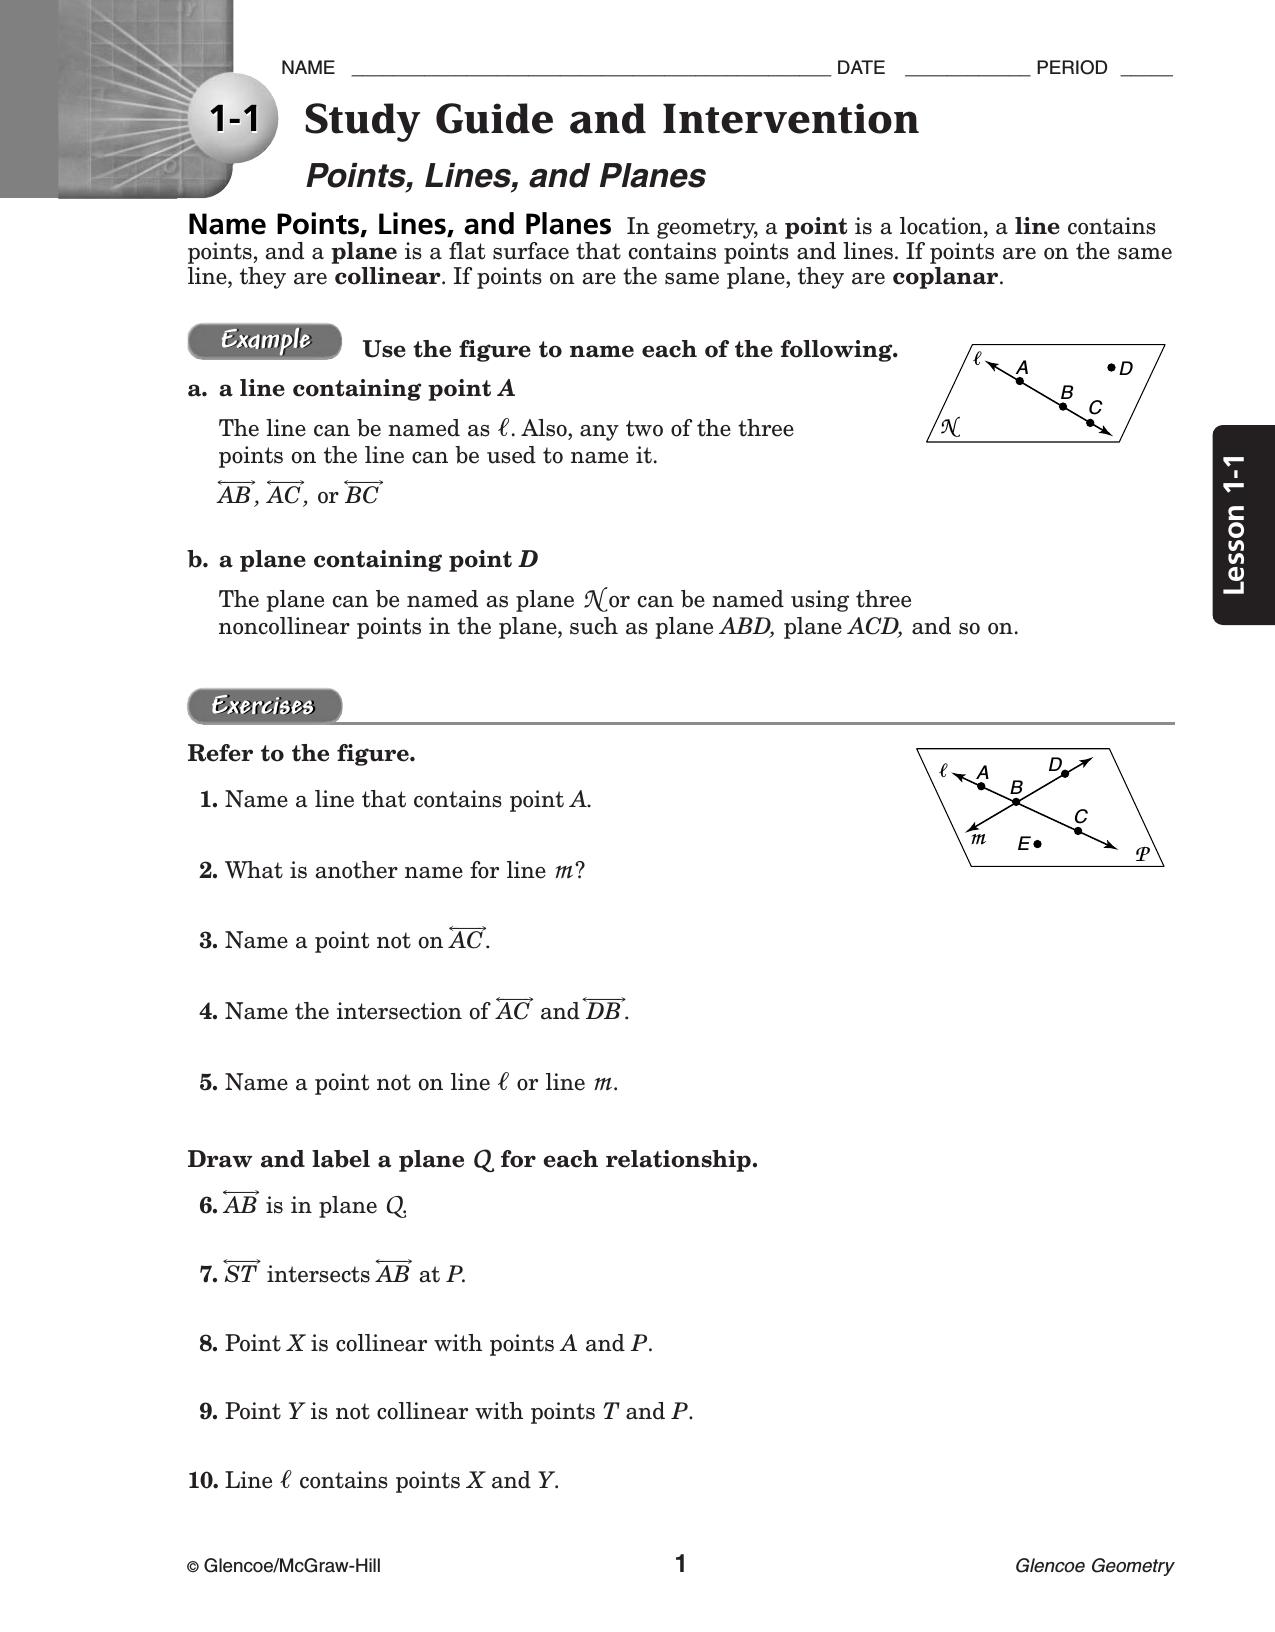 Glencoe Geometry Worksheet Answer Key